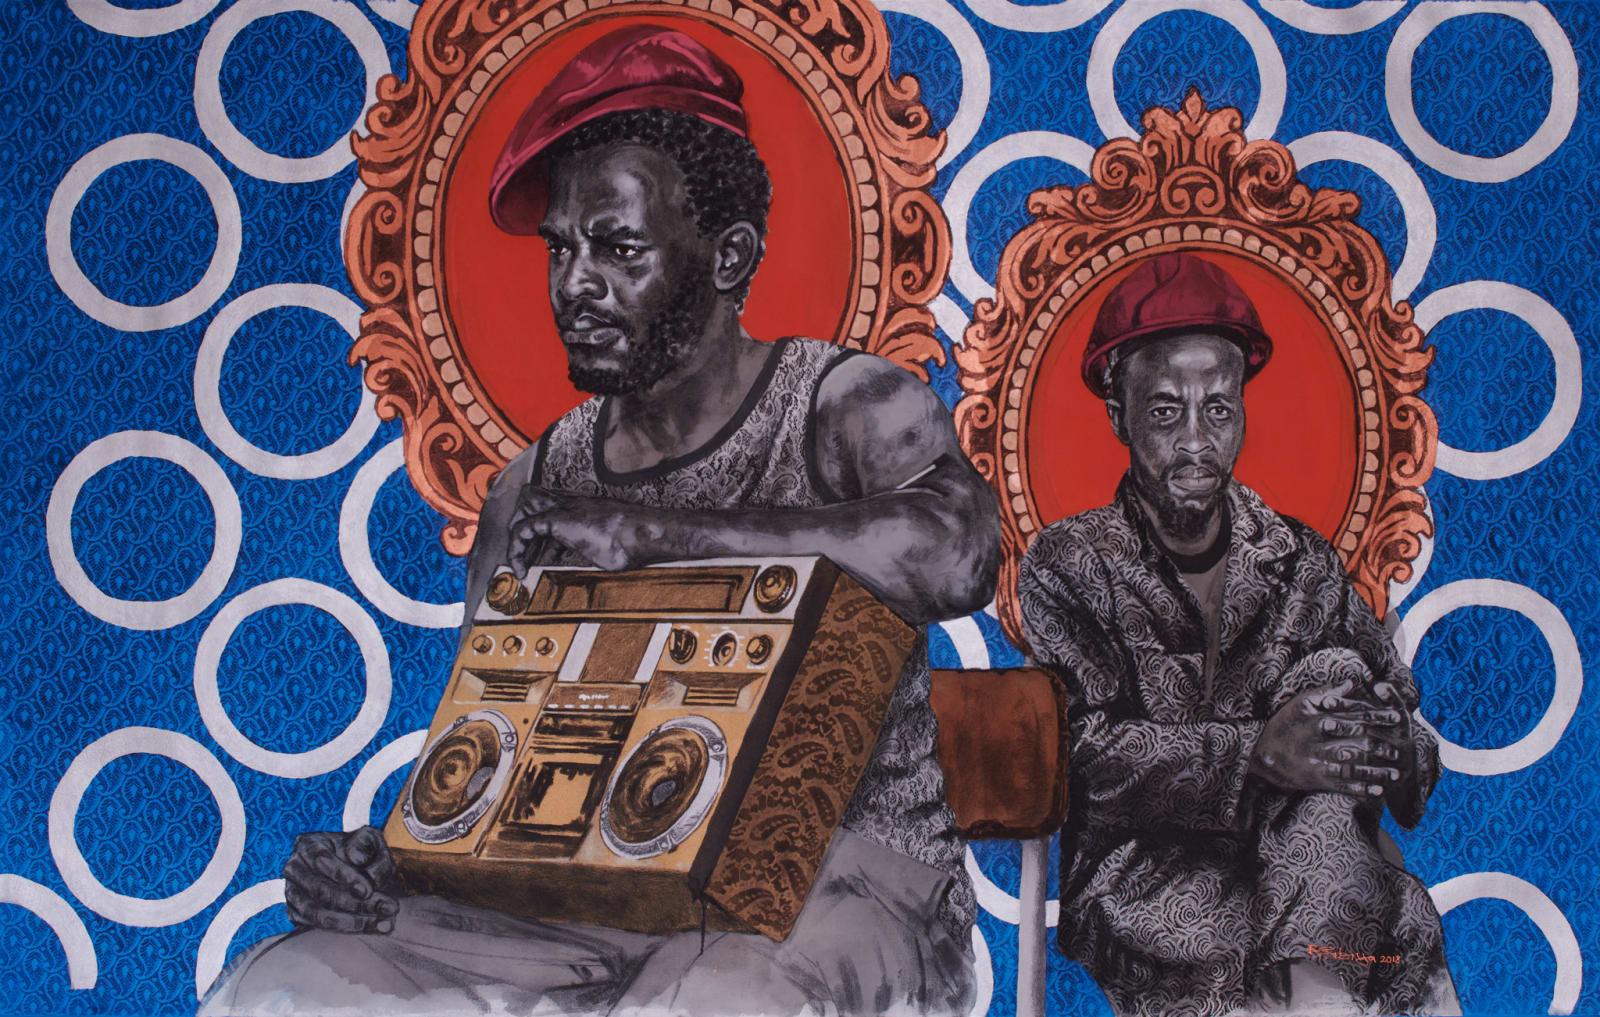 Bambo Sibiya  Sounds of Hope, 2018  Acrylic & charcoal on canvas  189 x 299 cm